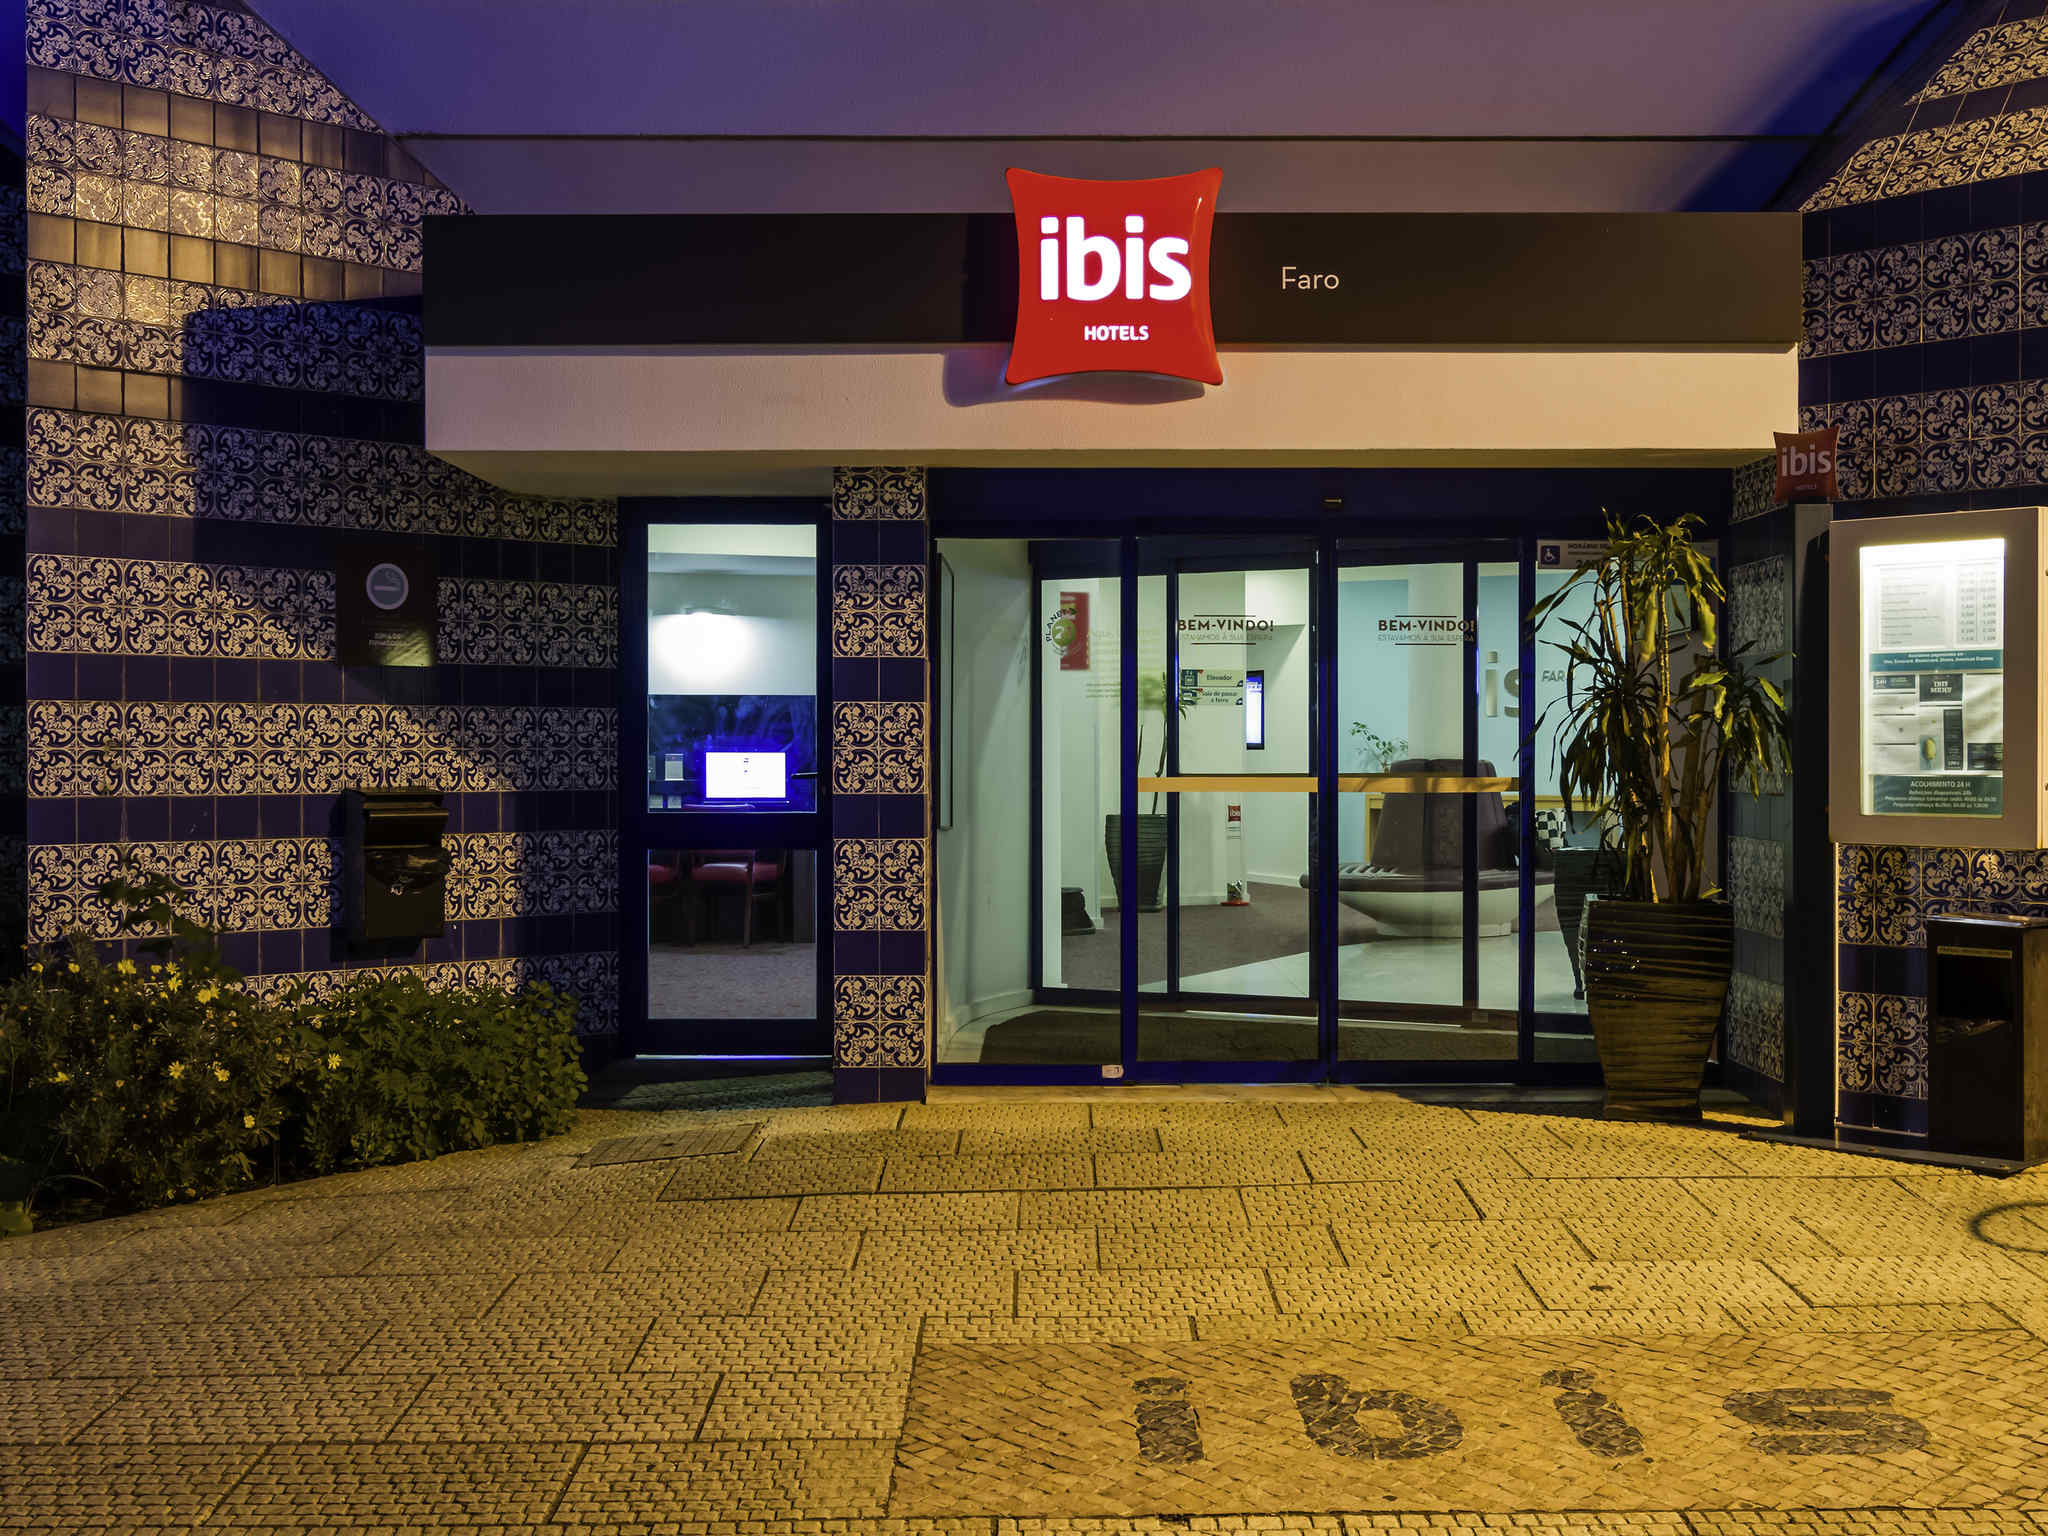 ibis portugal mapa ibis Faro is a hotel near the beaches of the Algarve ibis portugal mapa